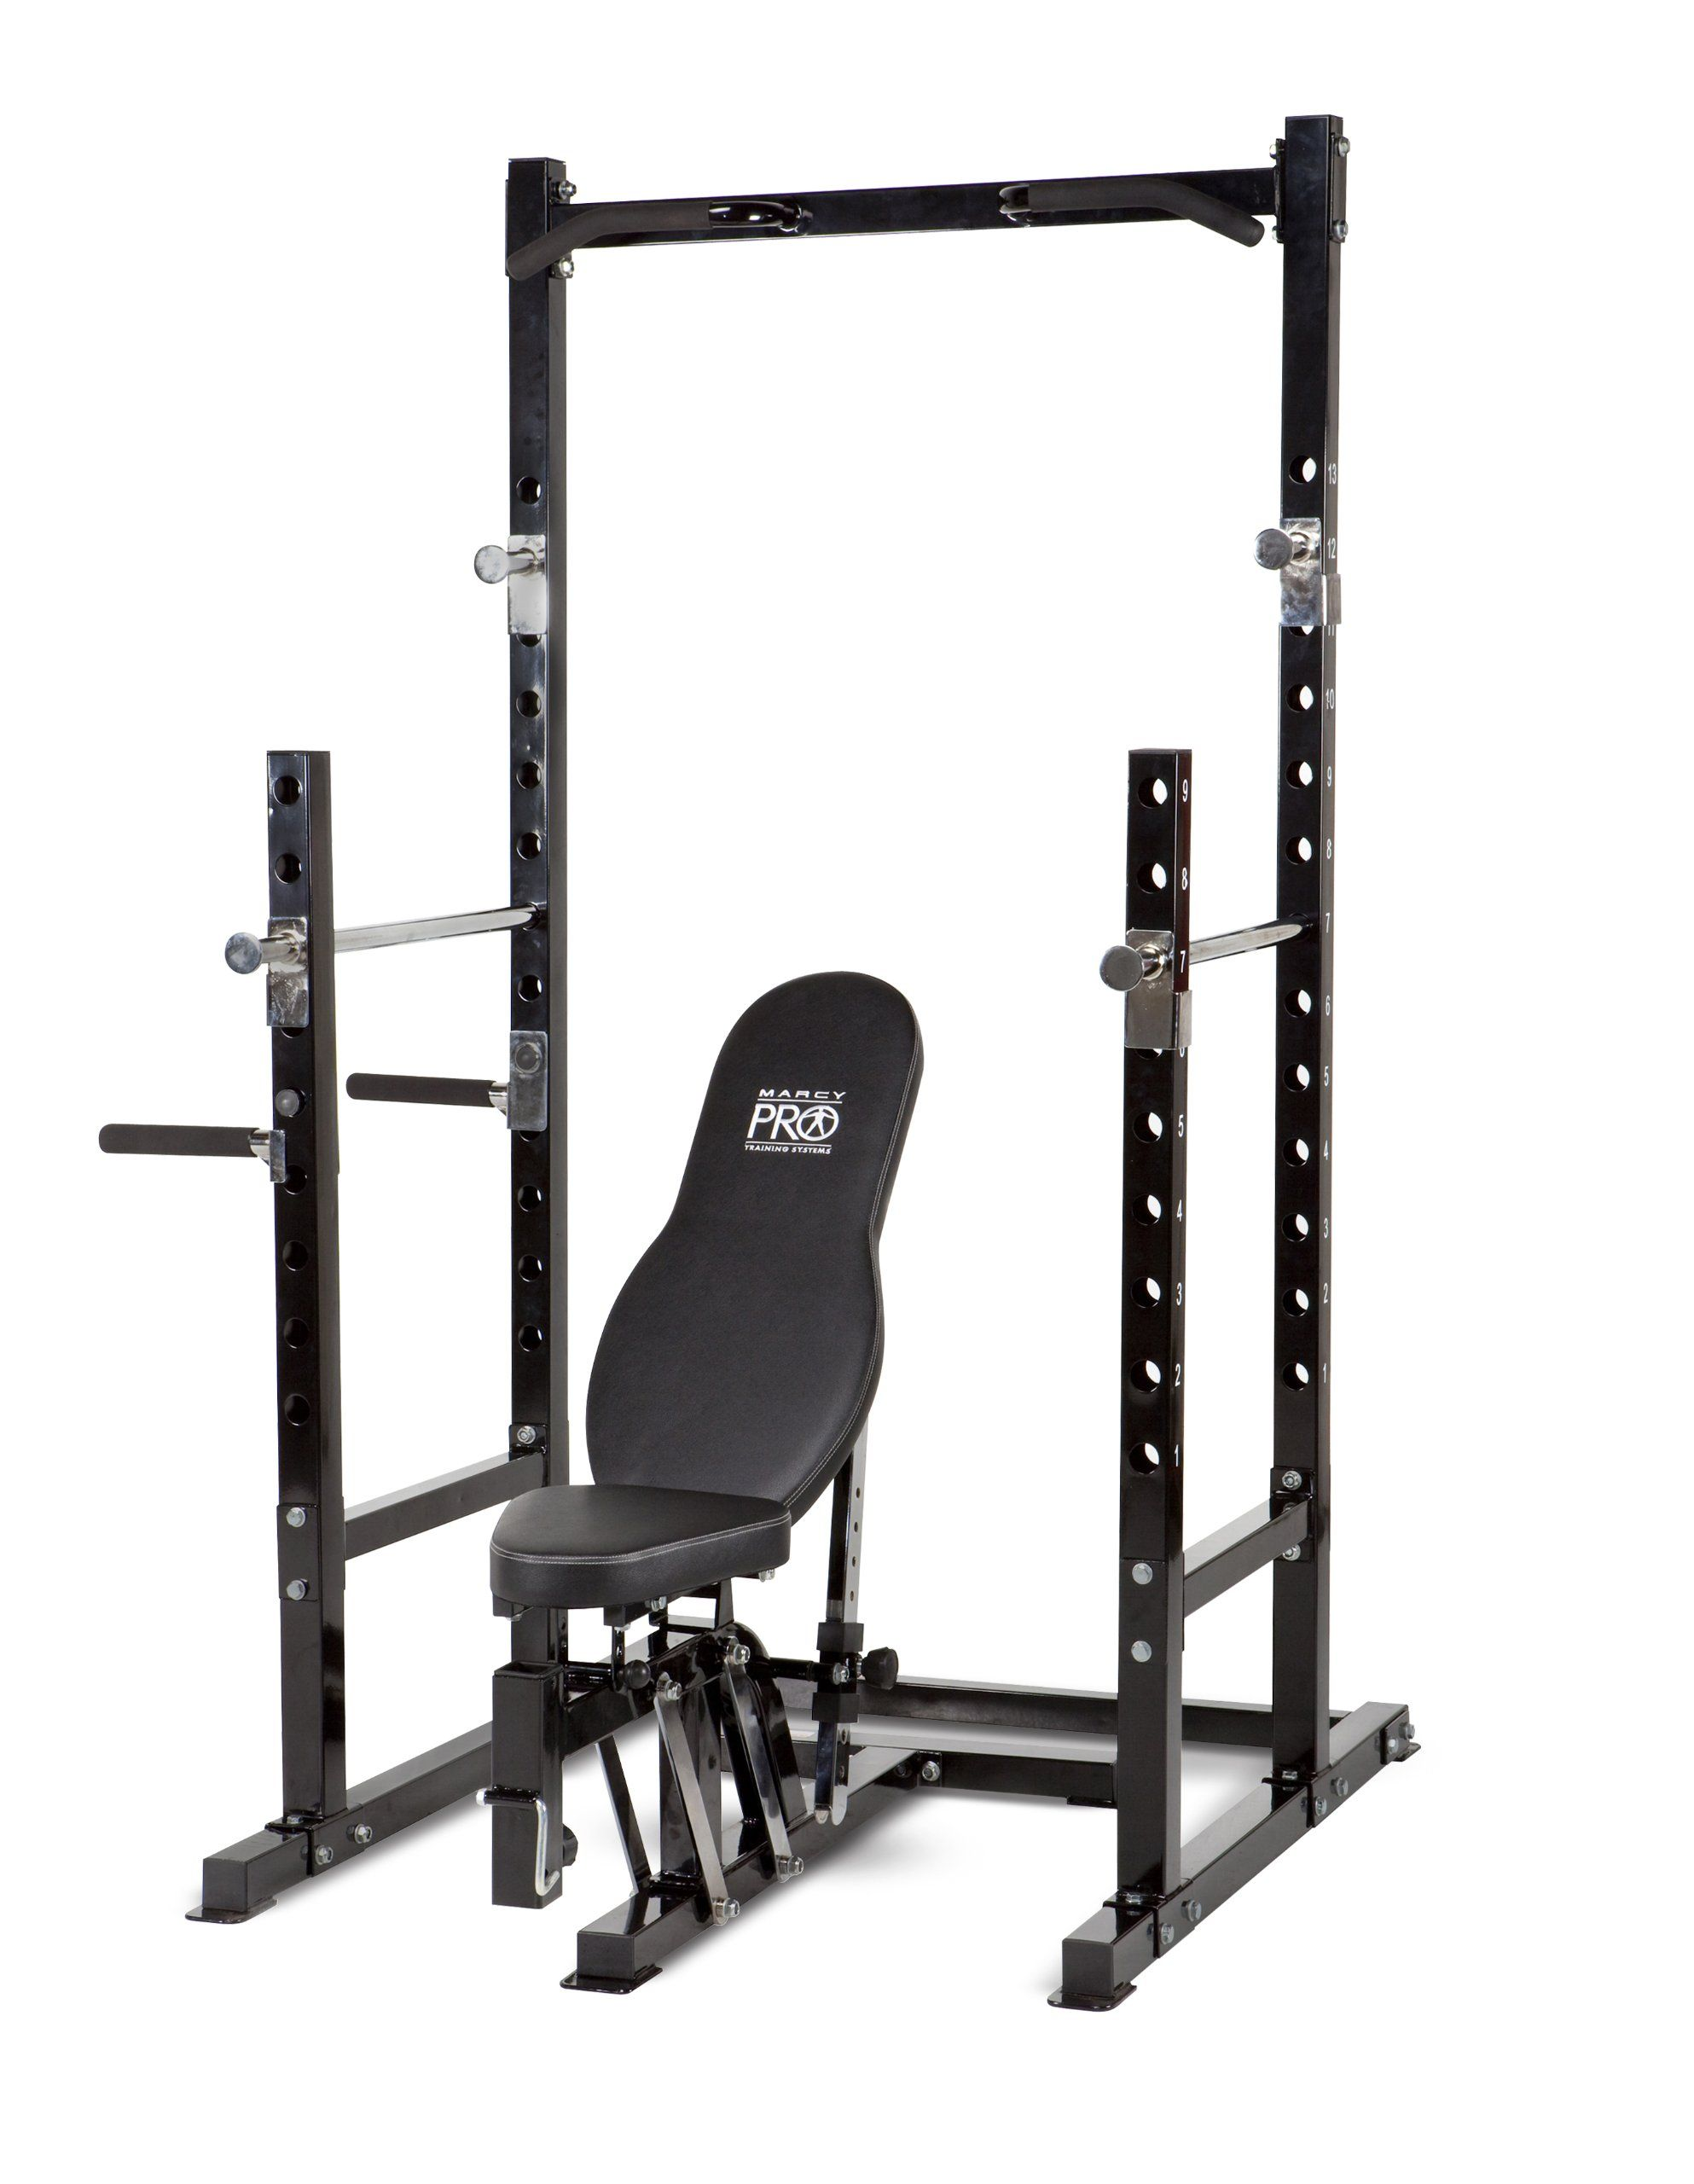 Valor Athletics Inc Bd 5 Safety Squat Bench Combo Rack Squat Rack Crossfit Squat Free Weight Stands Squat Rack Squat Rack Weight Benches At Home Gym